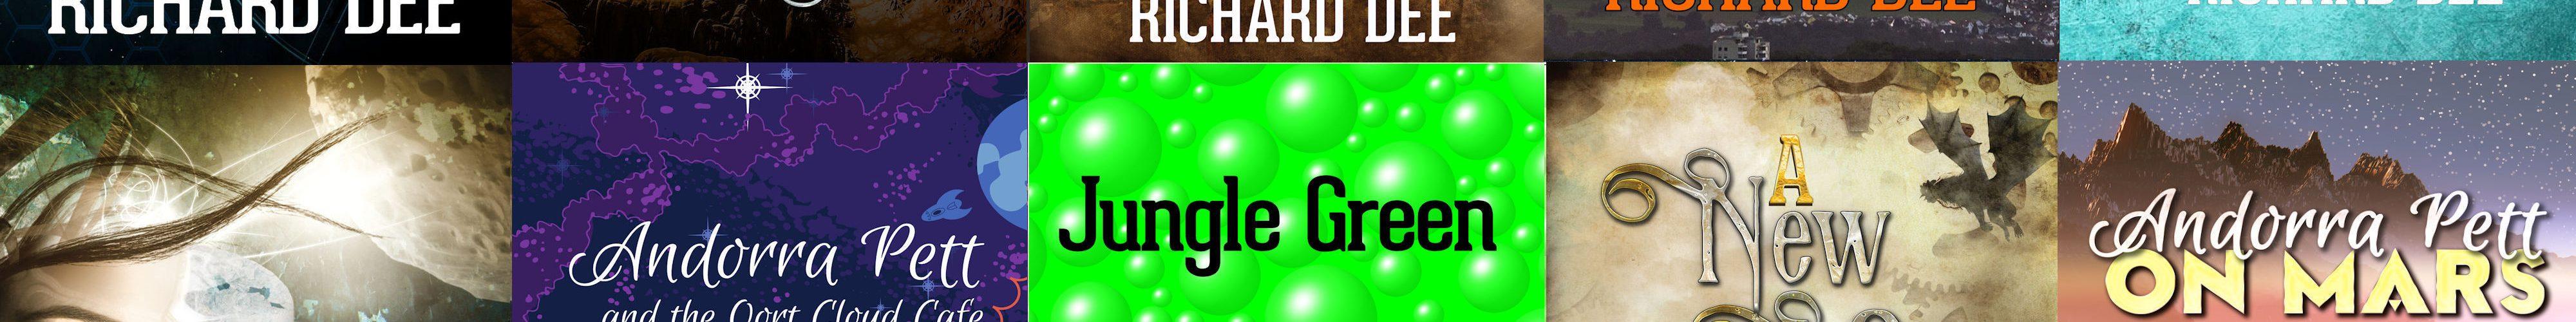 Richard Dee's Books